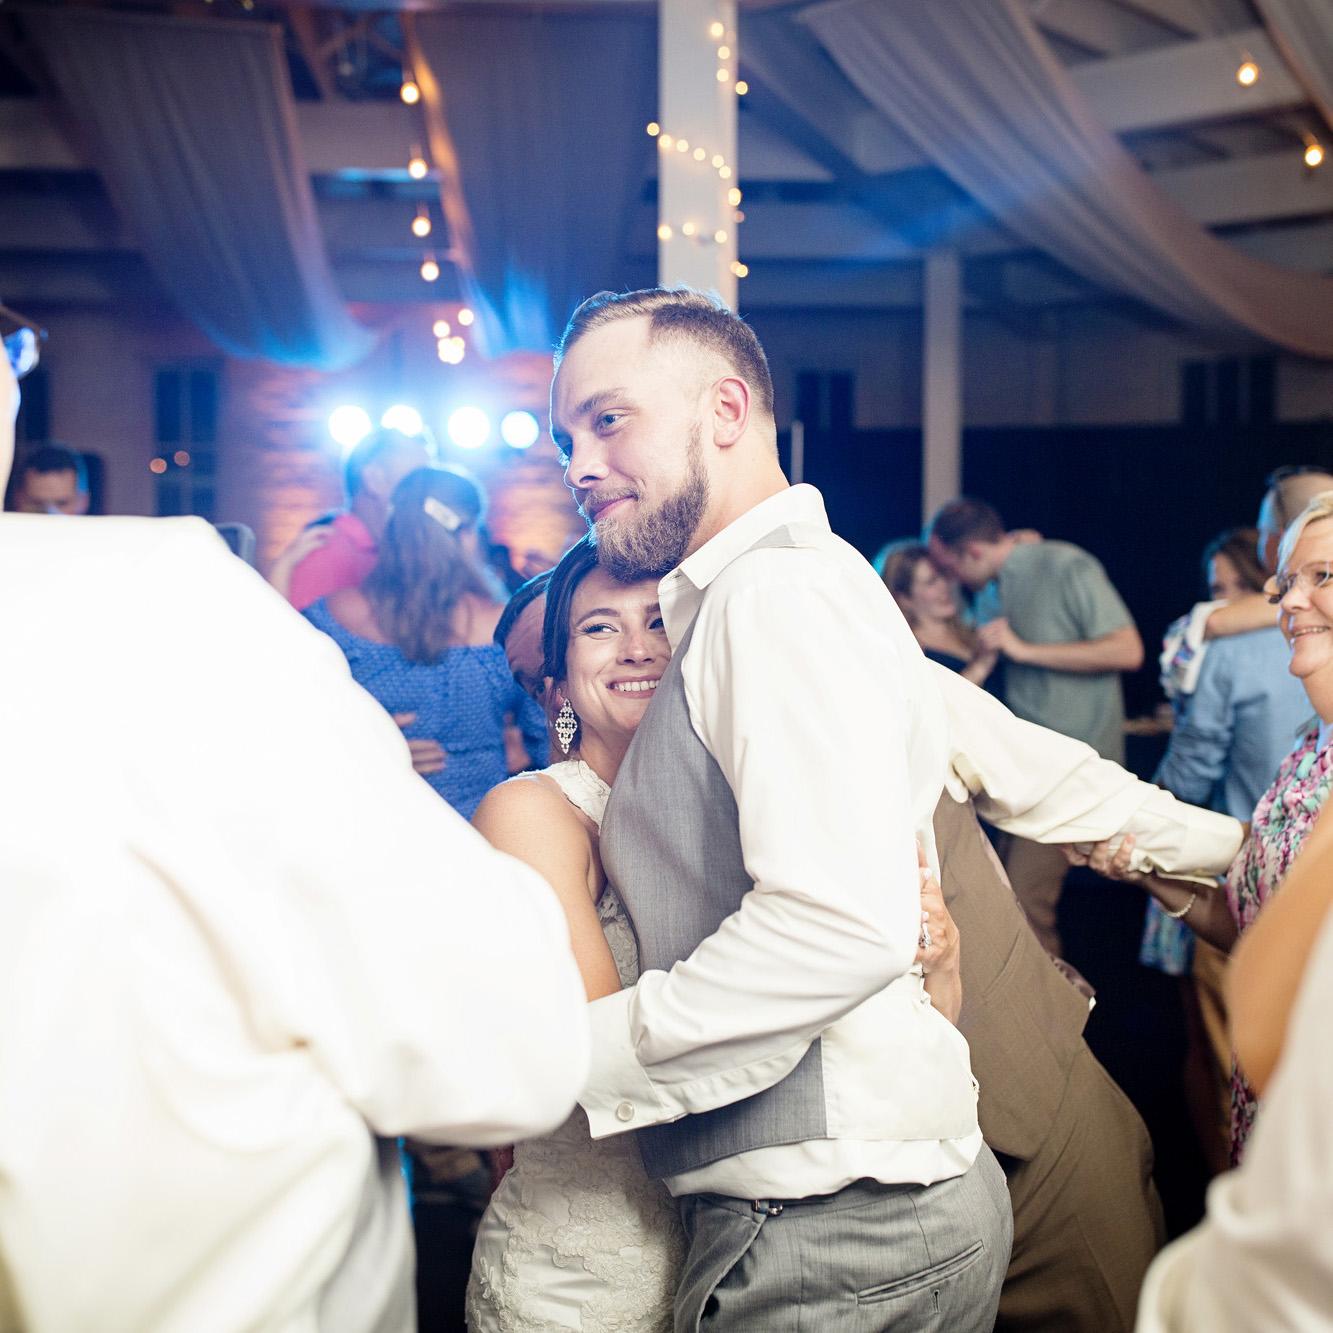 Seriously_Sabrina_Photography_Lexington_Kentucky_Round_Barn_Red_Mile_Stable_of_Memories_Wedding_Hart_132.jpg